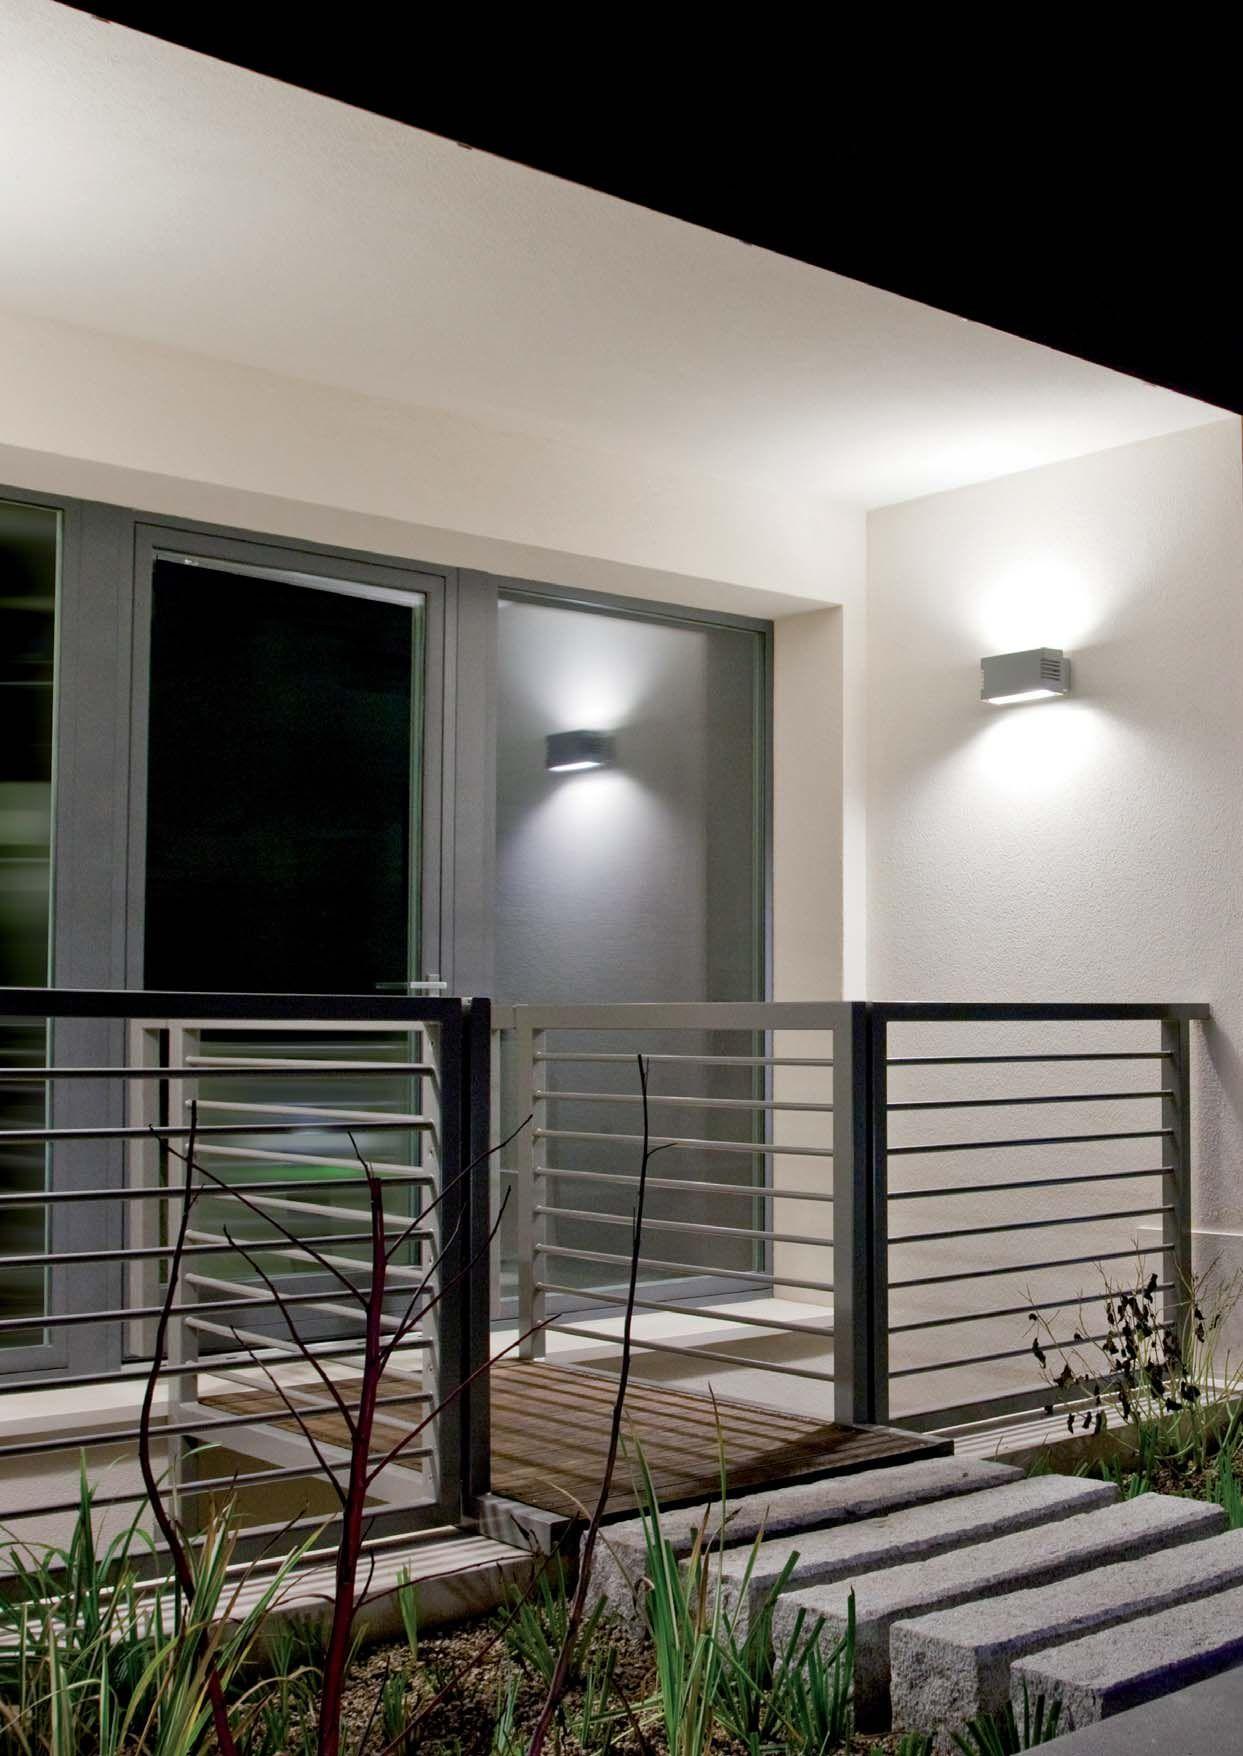 Iluminacin tcnica para exterior con luz fluorescente, led o halogeno,  modelo Duplo.Q. Walkway IdeasWall ...